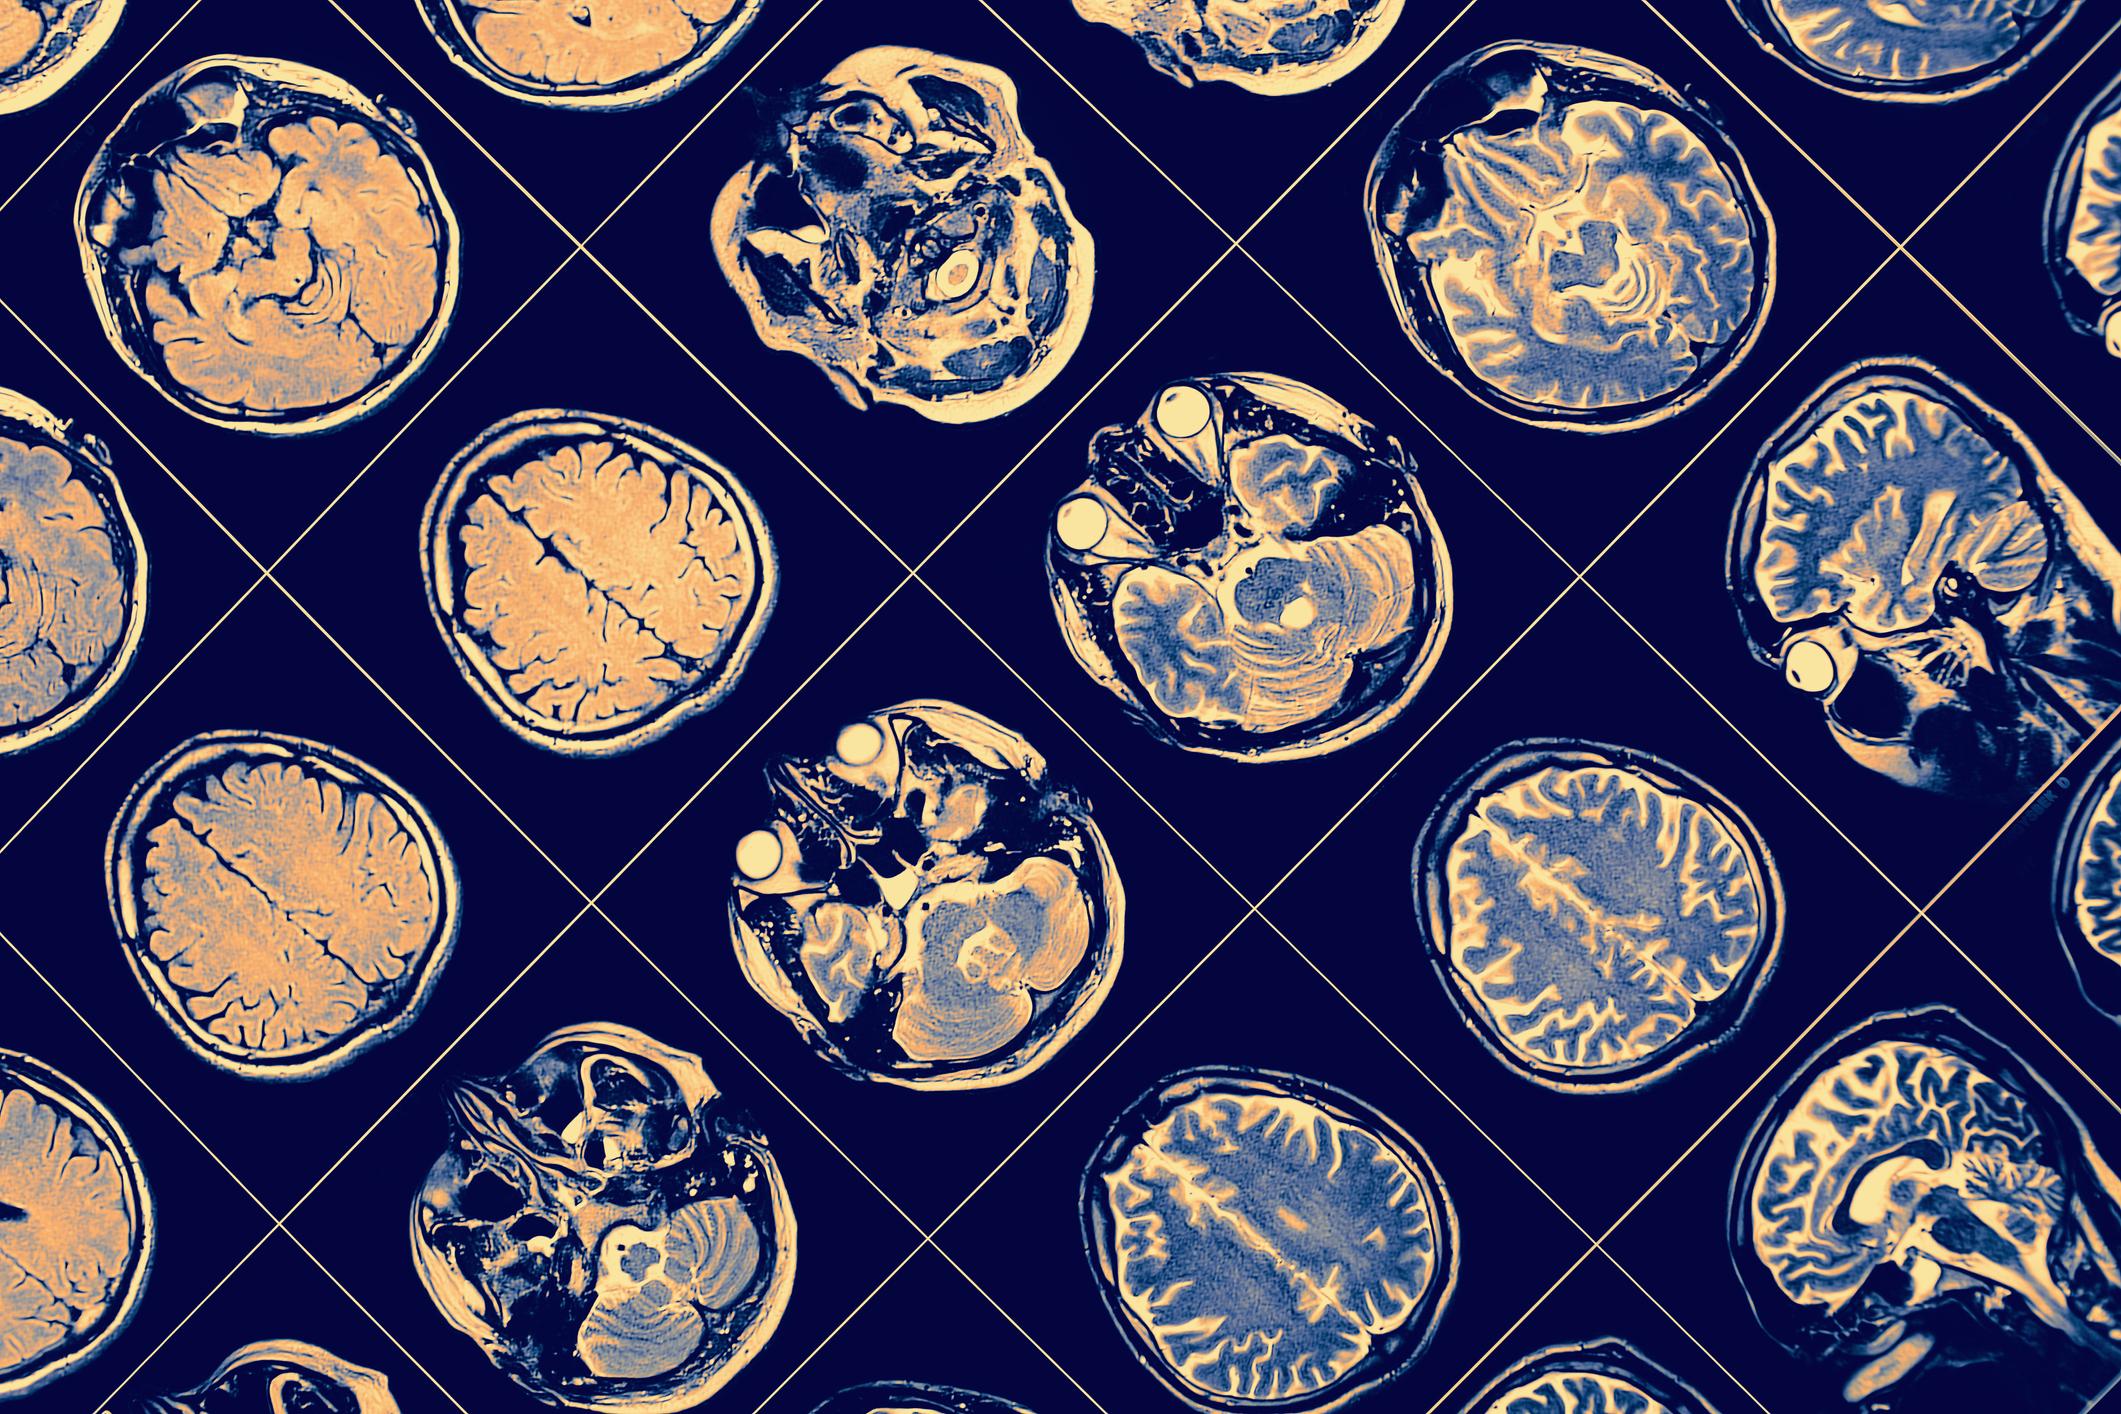 Hyperbaric oxygen therapy reversed hallmarks of Alzheimer's